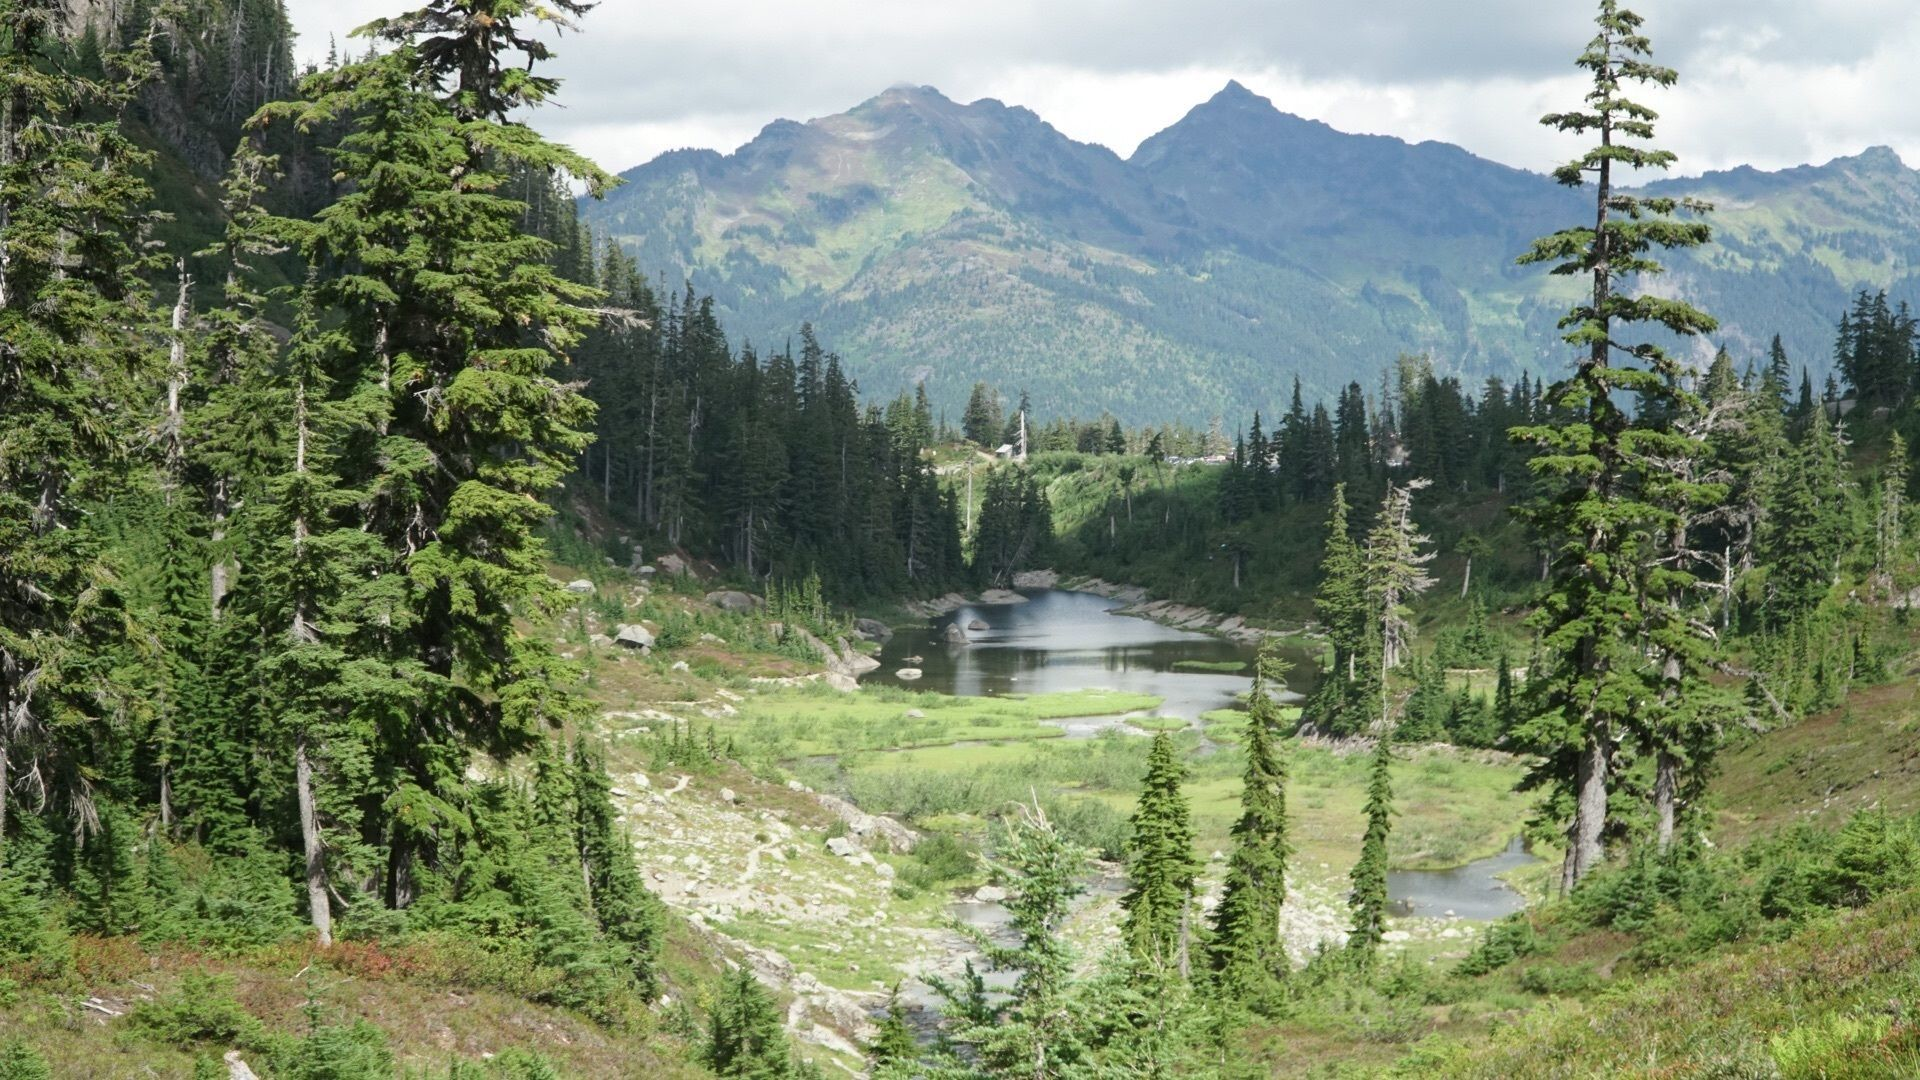 Maple Creek Park, Maple Falls, Washington